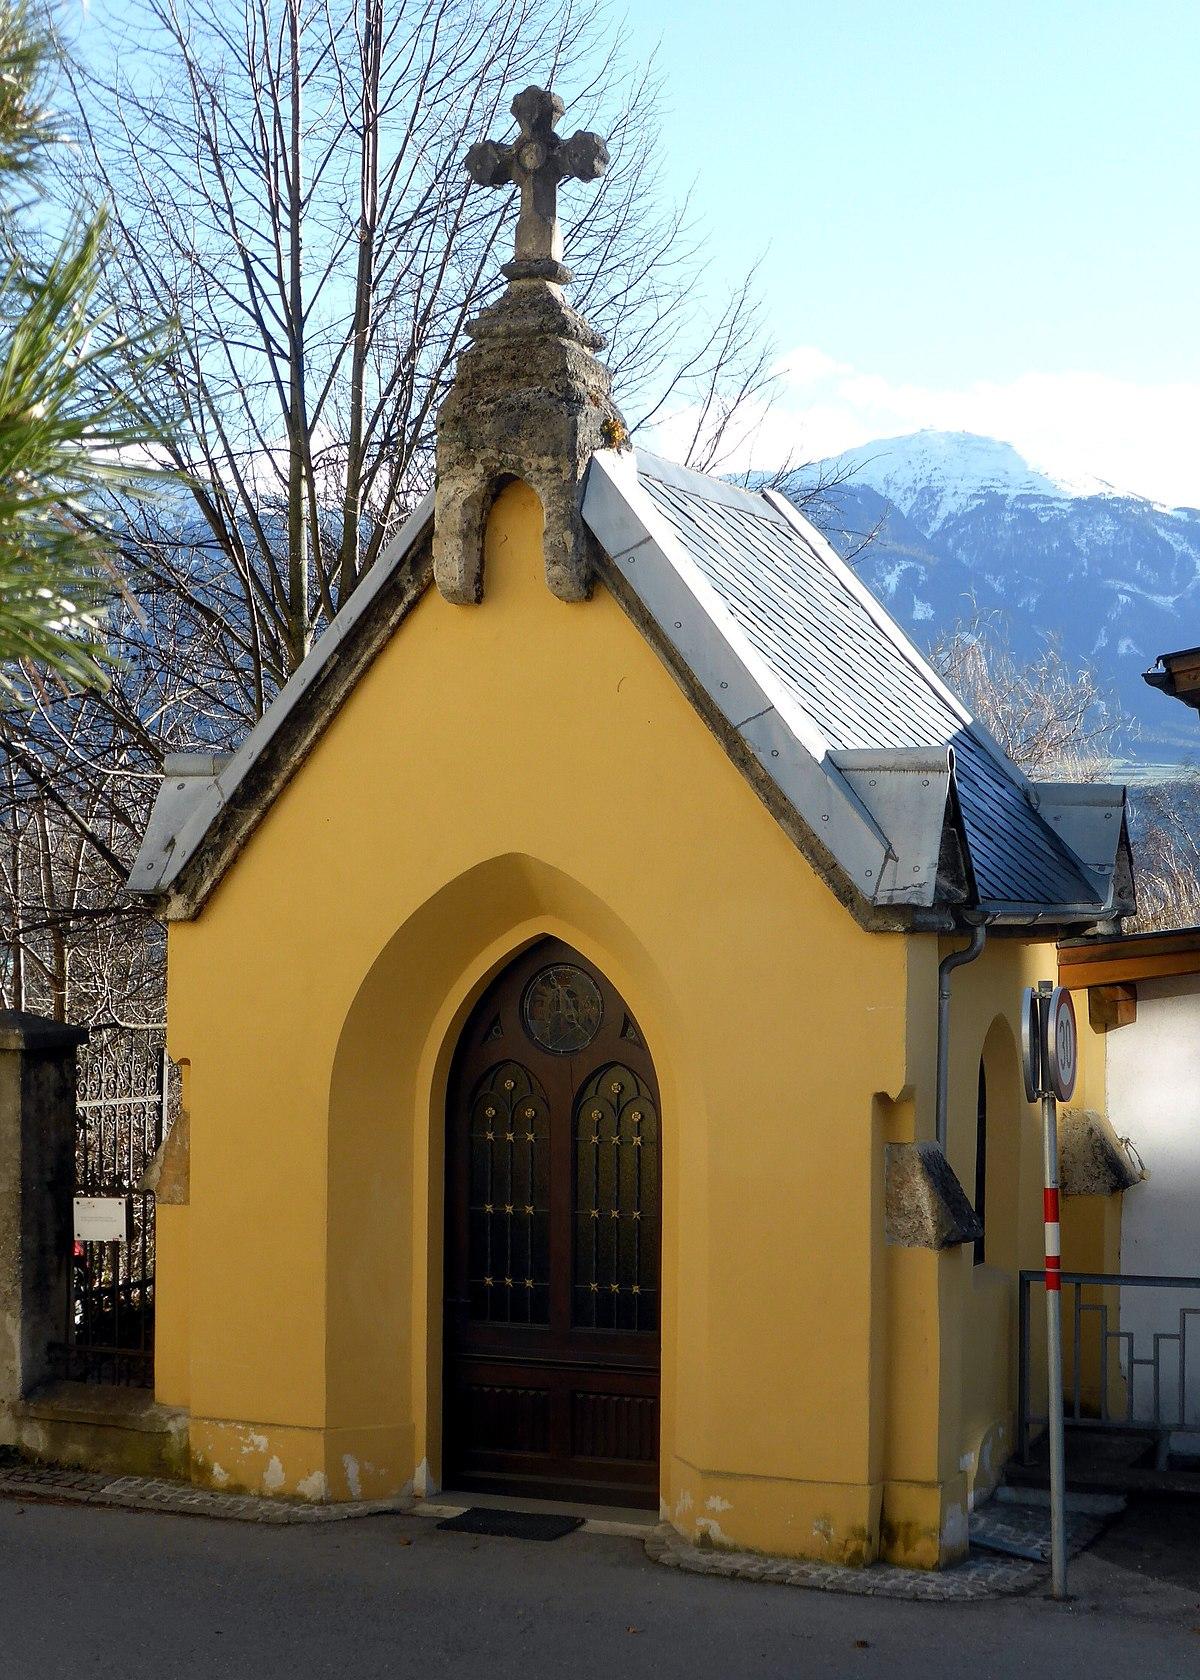 Escort Service Mhlau (Innsbruck) | Locanto Erotik Dating